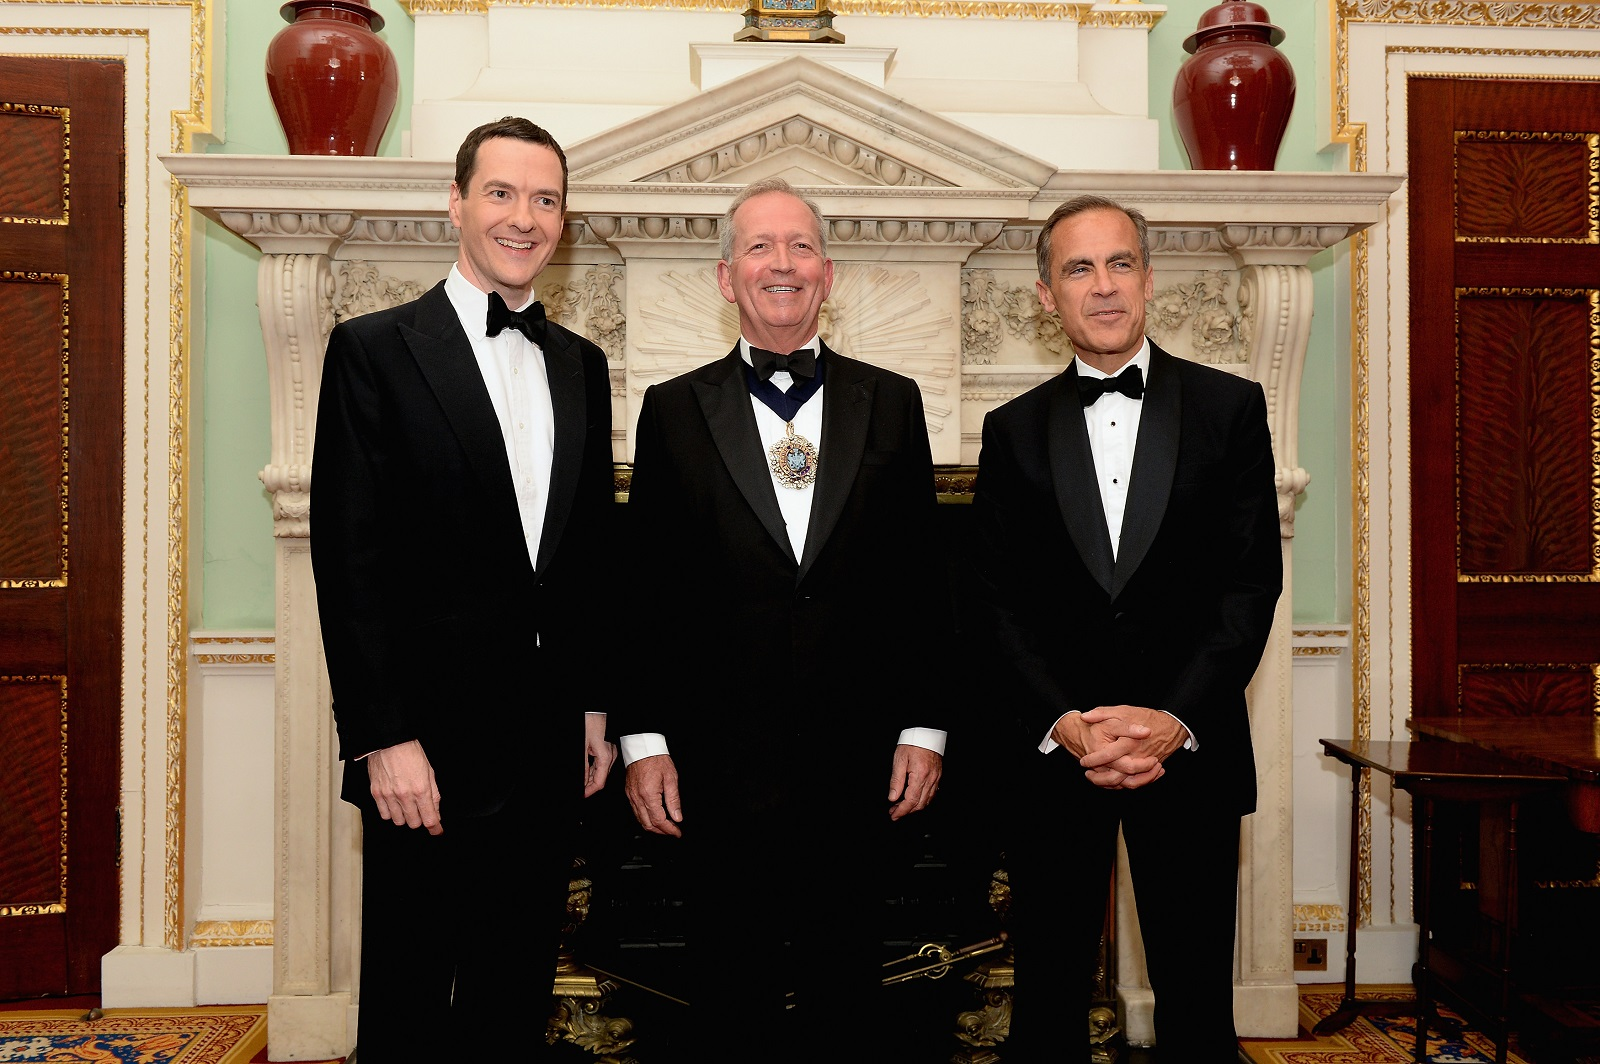 George Osborne at the Mansion House 2015